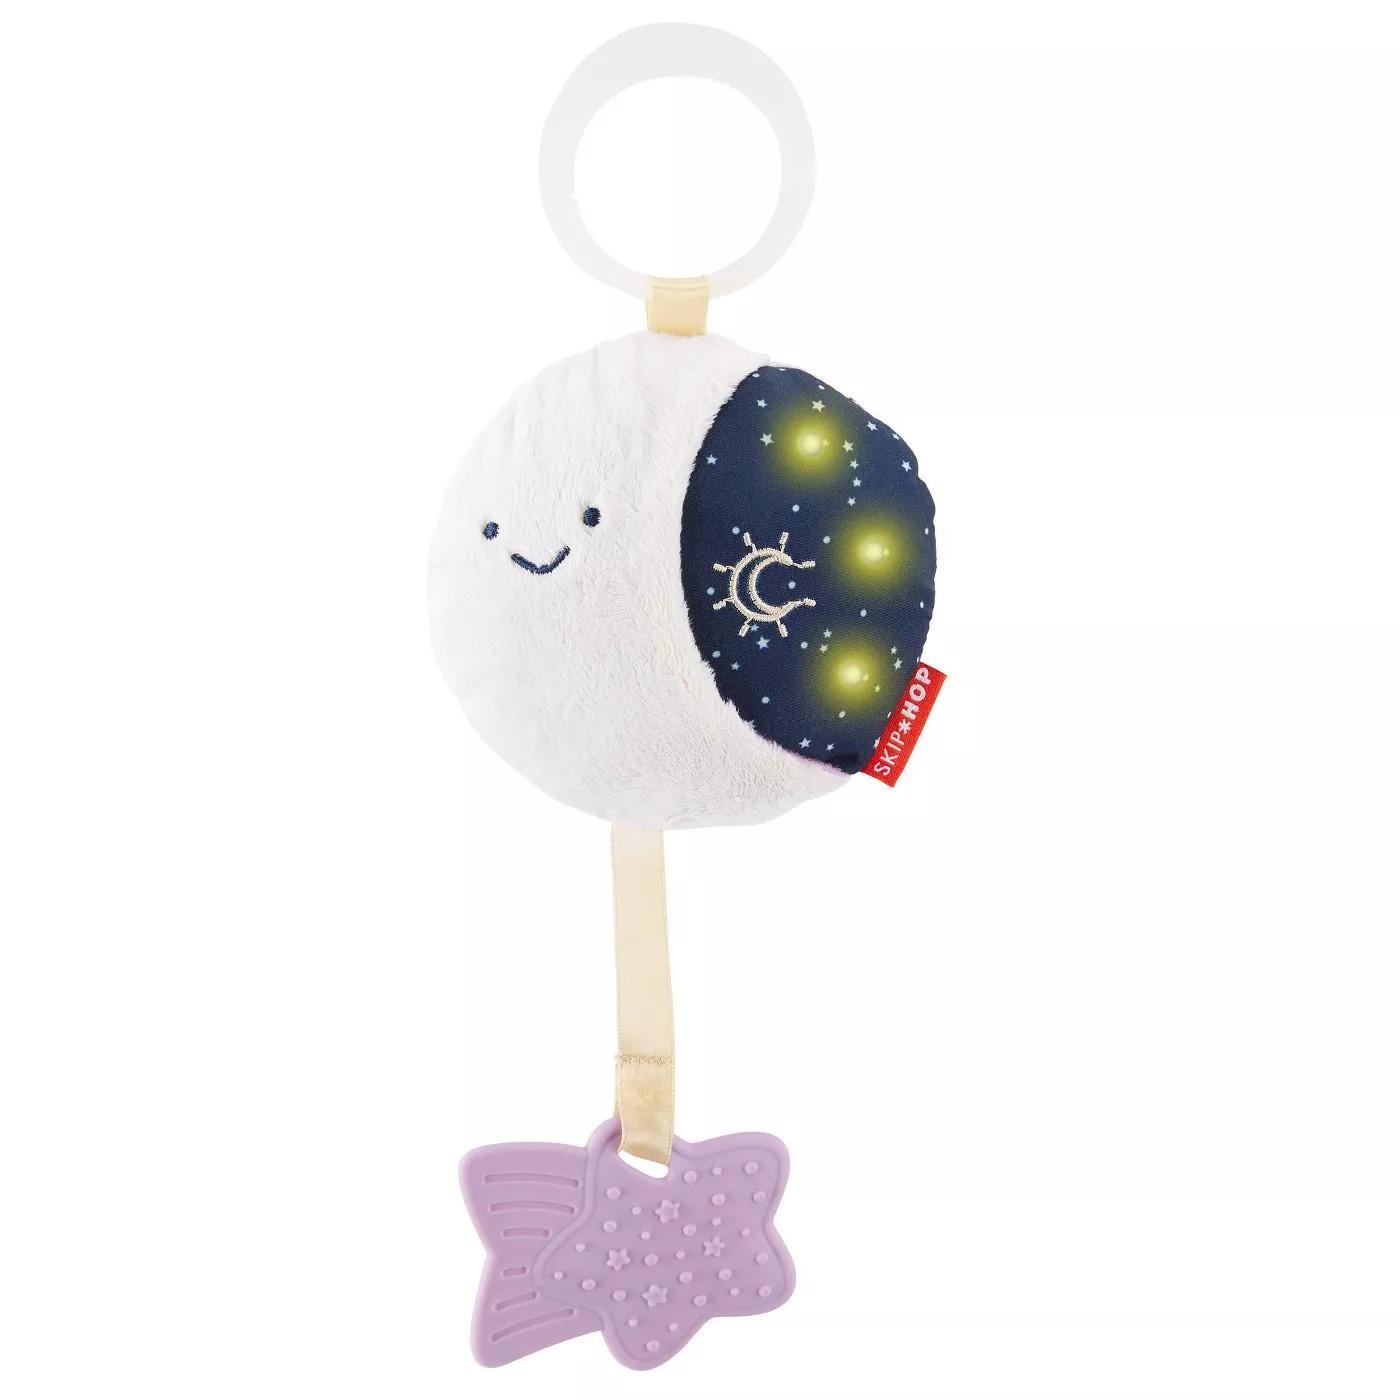 Skip Hop - Celestial Dreams Moonglow Musical Toy